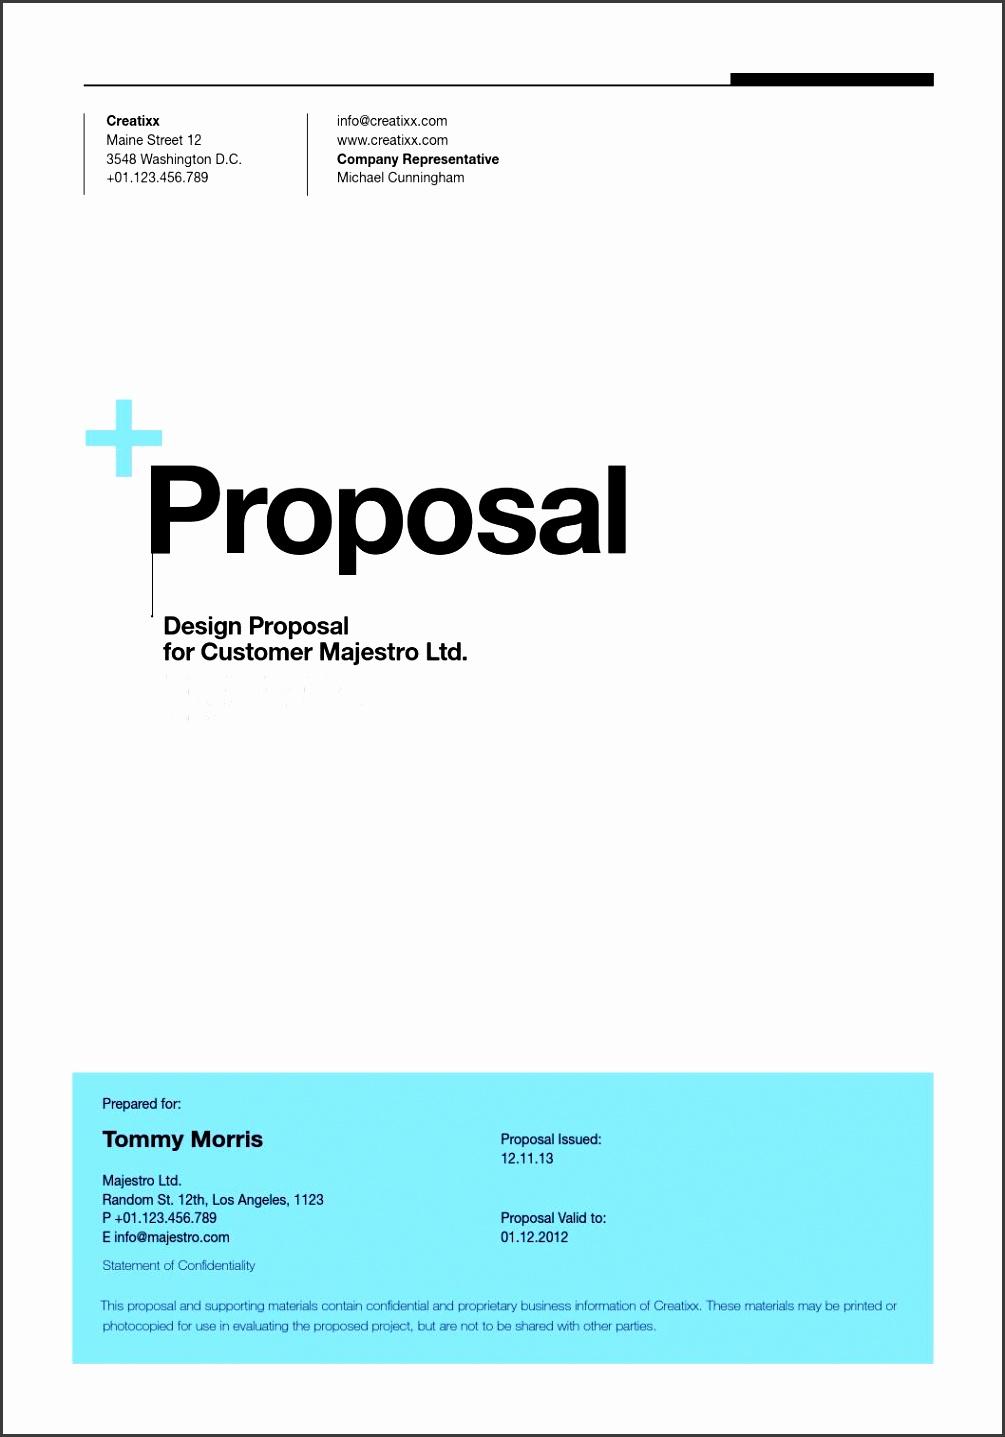 Free Sample Business Proposal Letter 01 Sample Sponsorship Page 1 Free Sample Business Proposal Letter 01 Proposal Letter Sample Doc Nbvfn